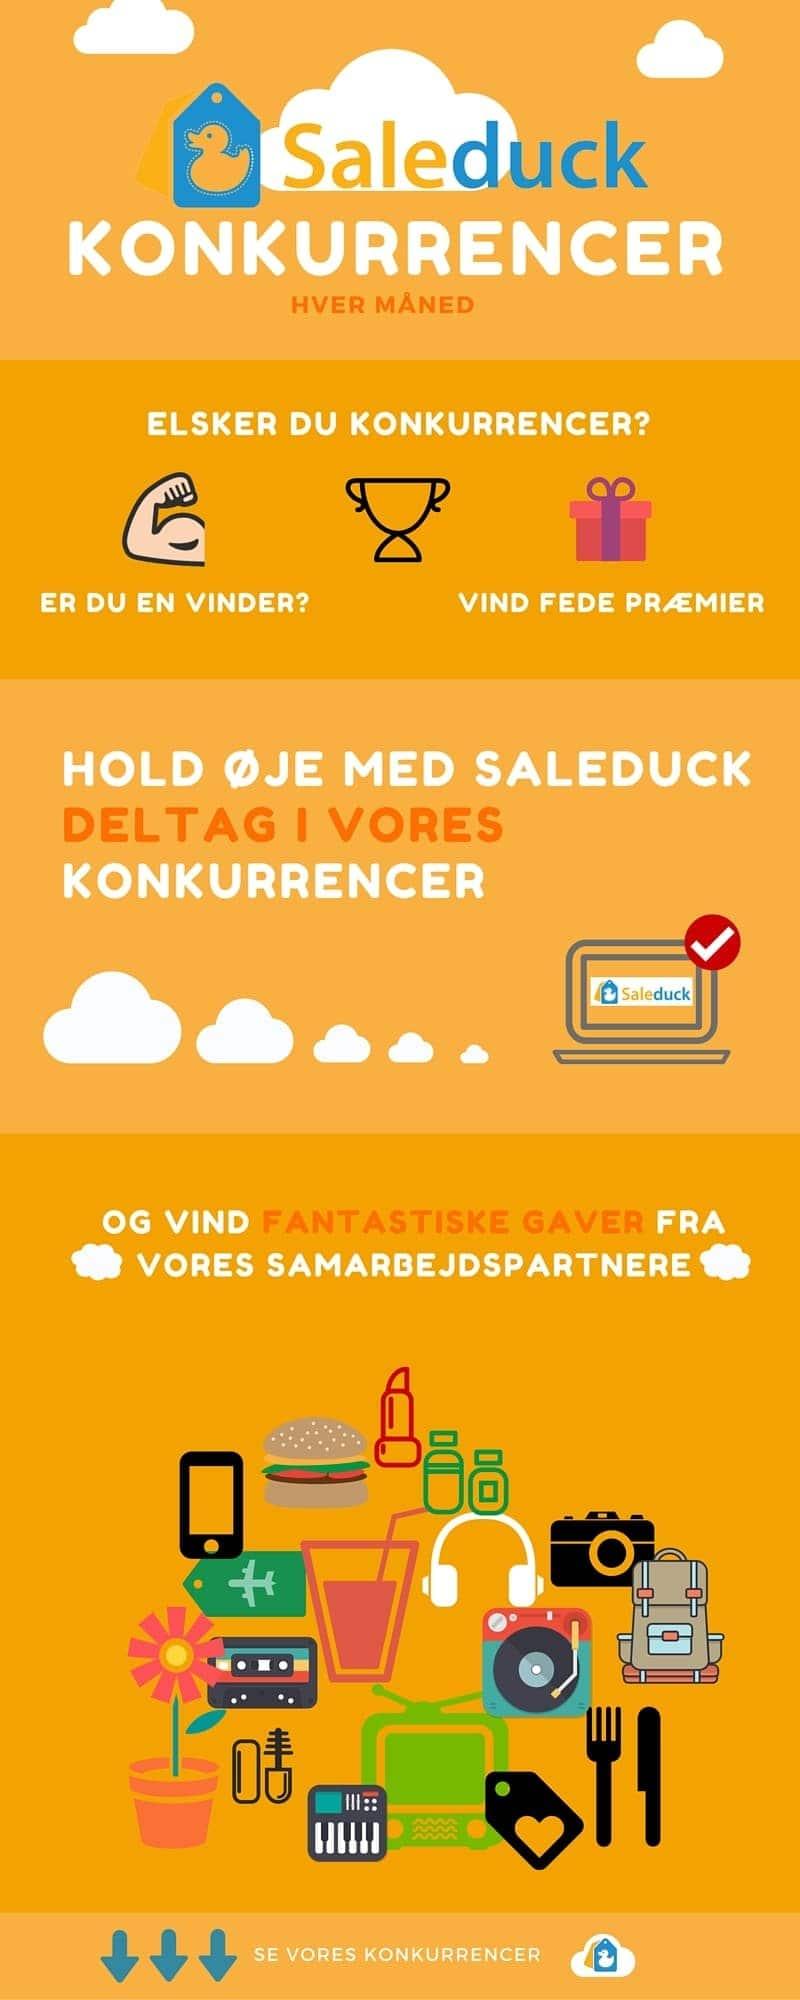 KONKURRENCER SALEDUCK DENMARK (1).jpg